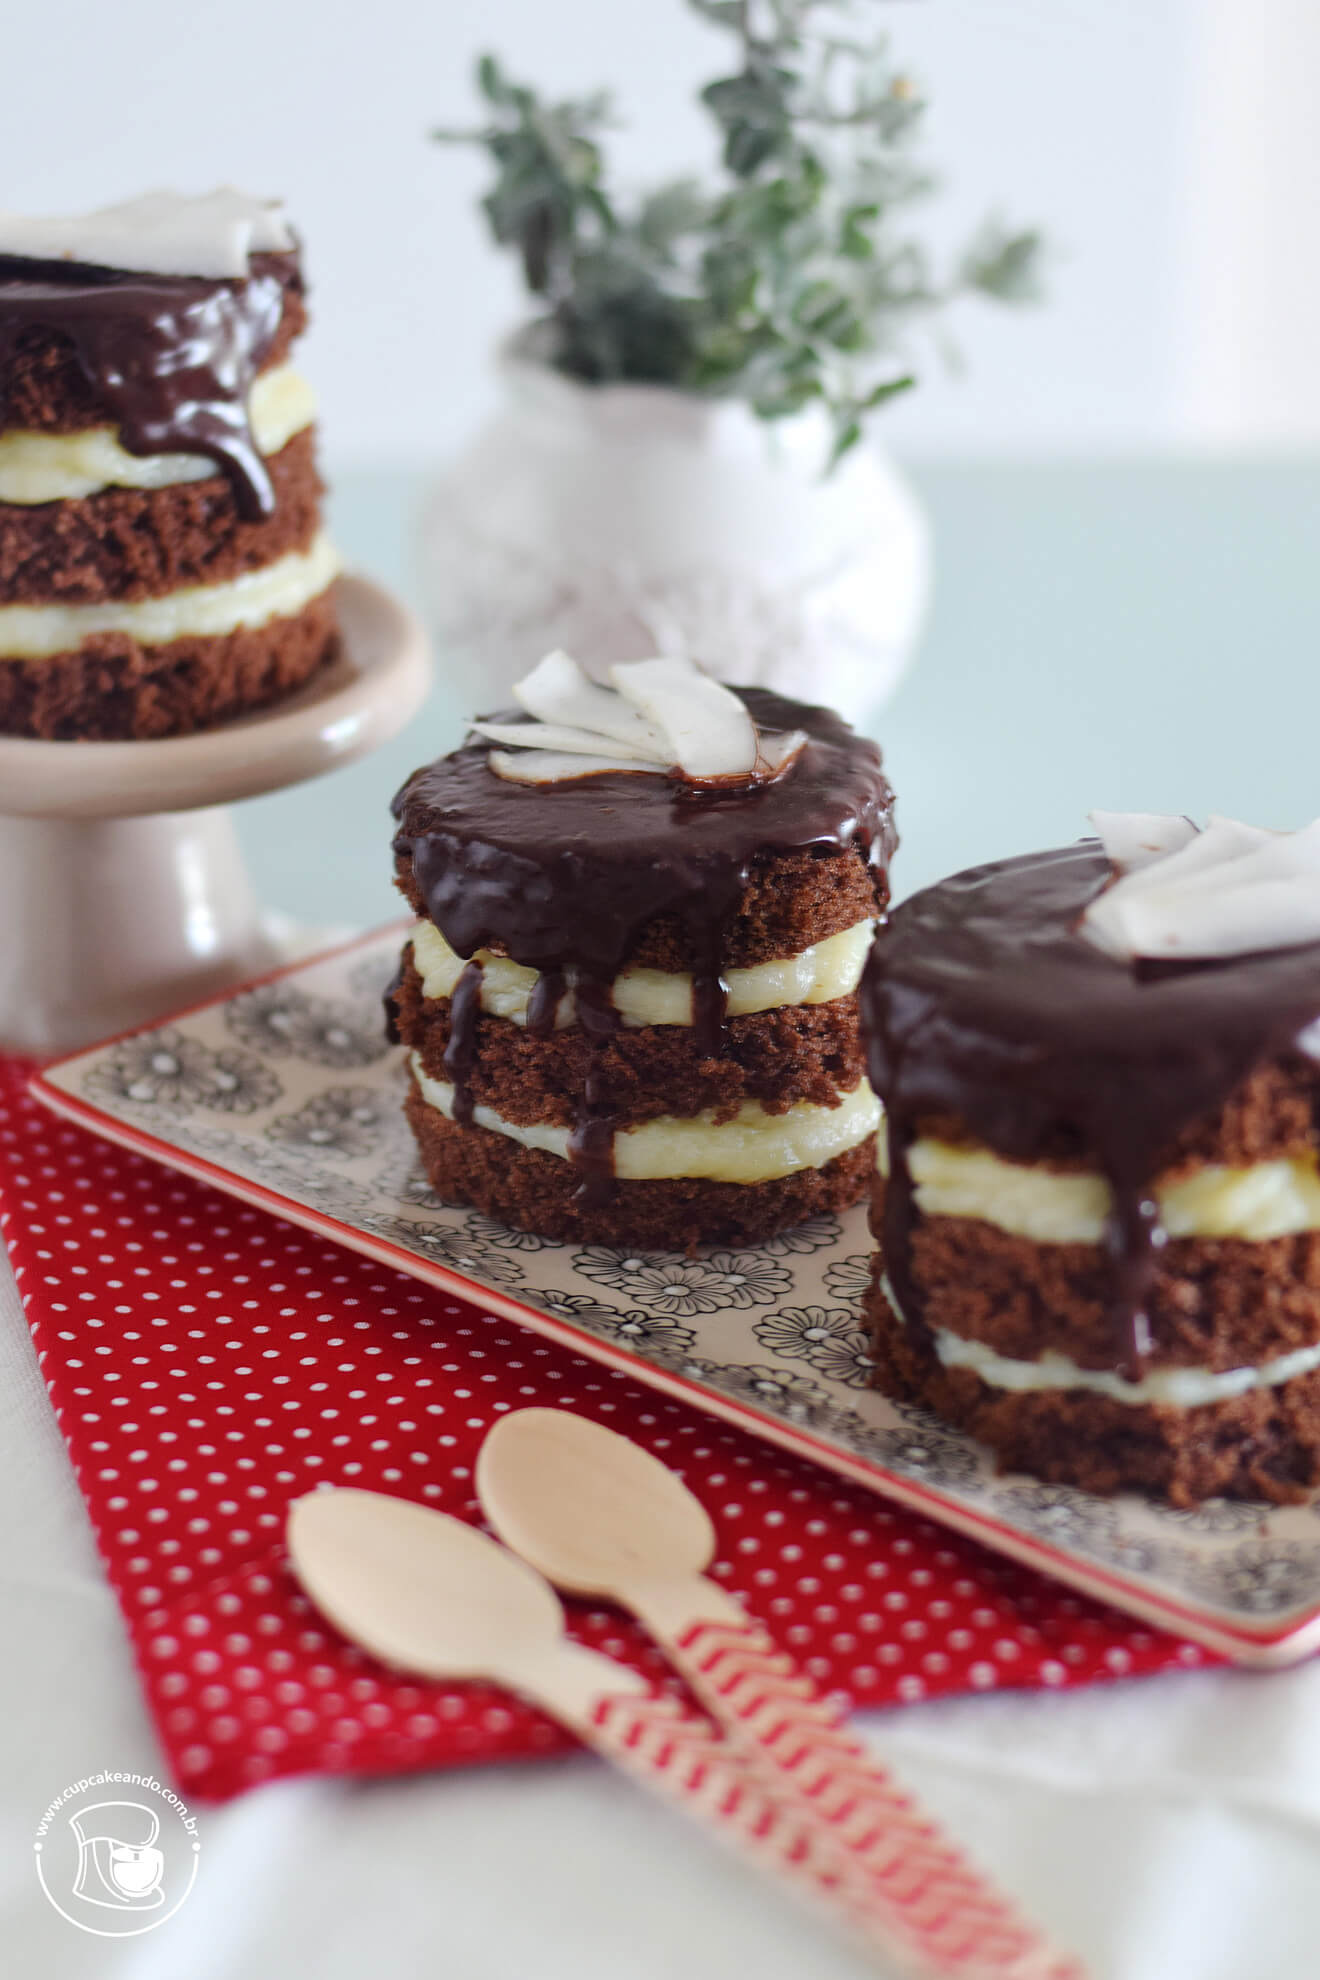 Minibolos naked cakes de prestígio, chocolate e coco